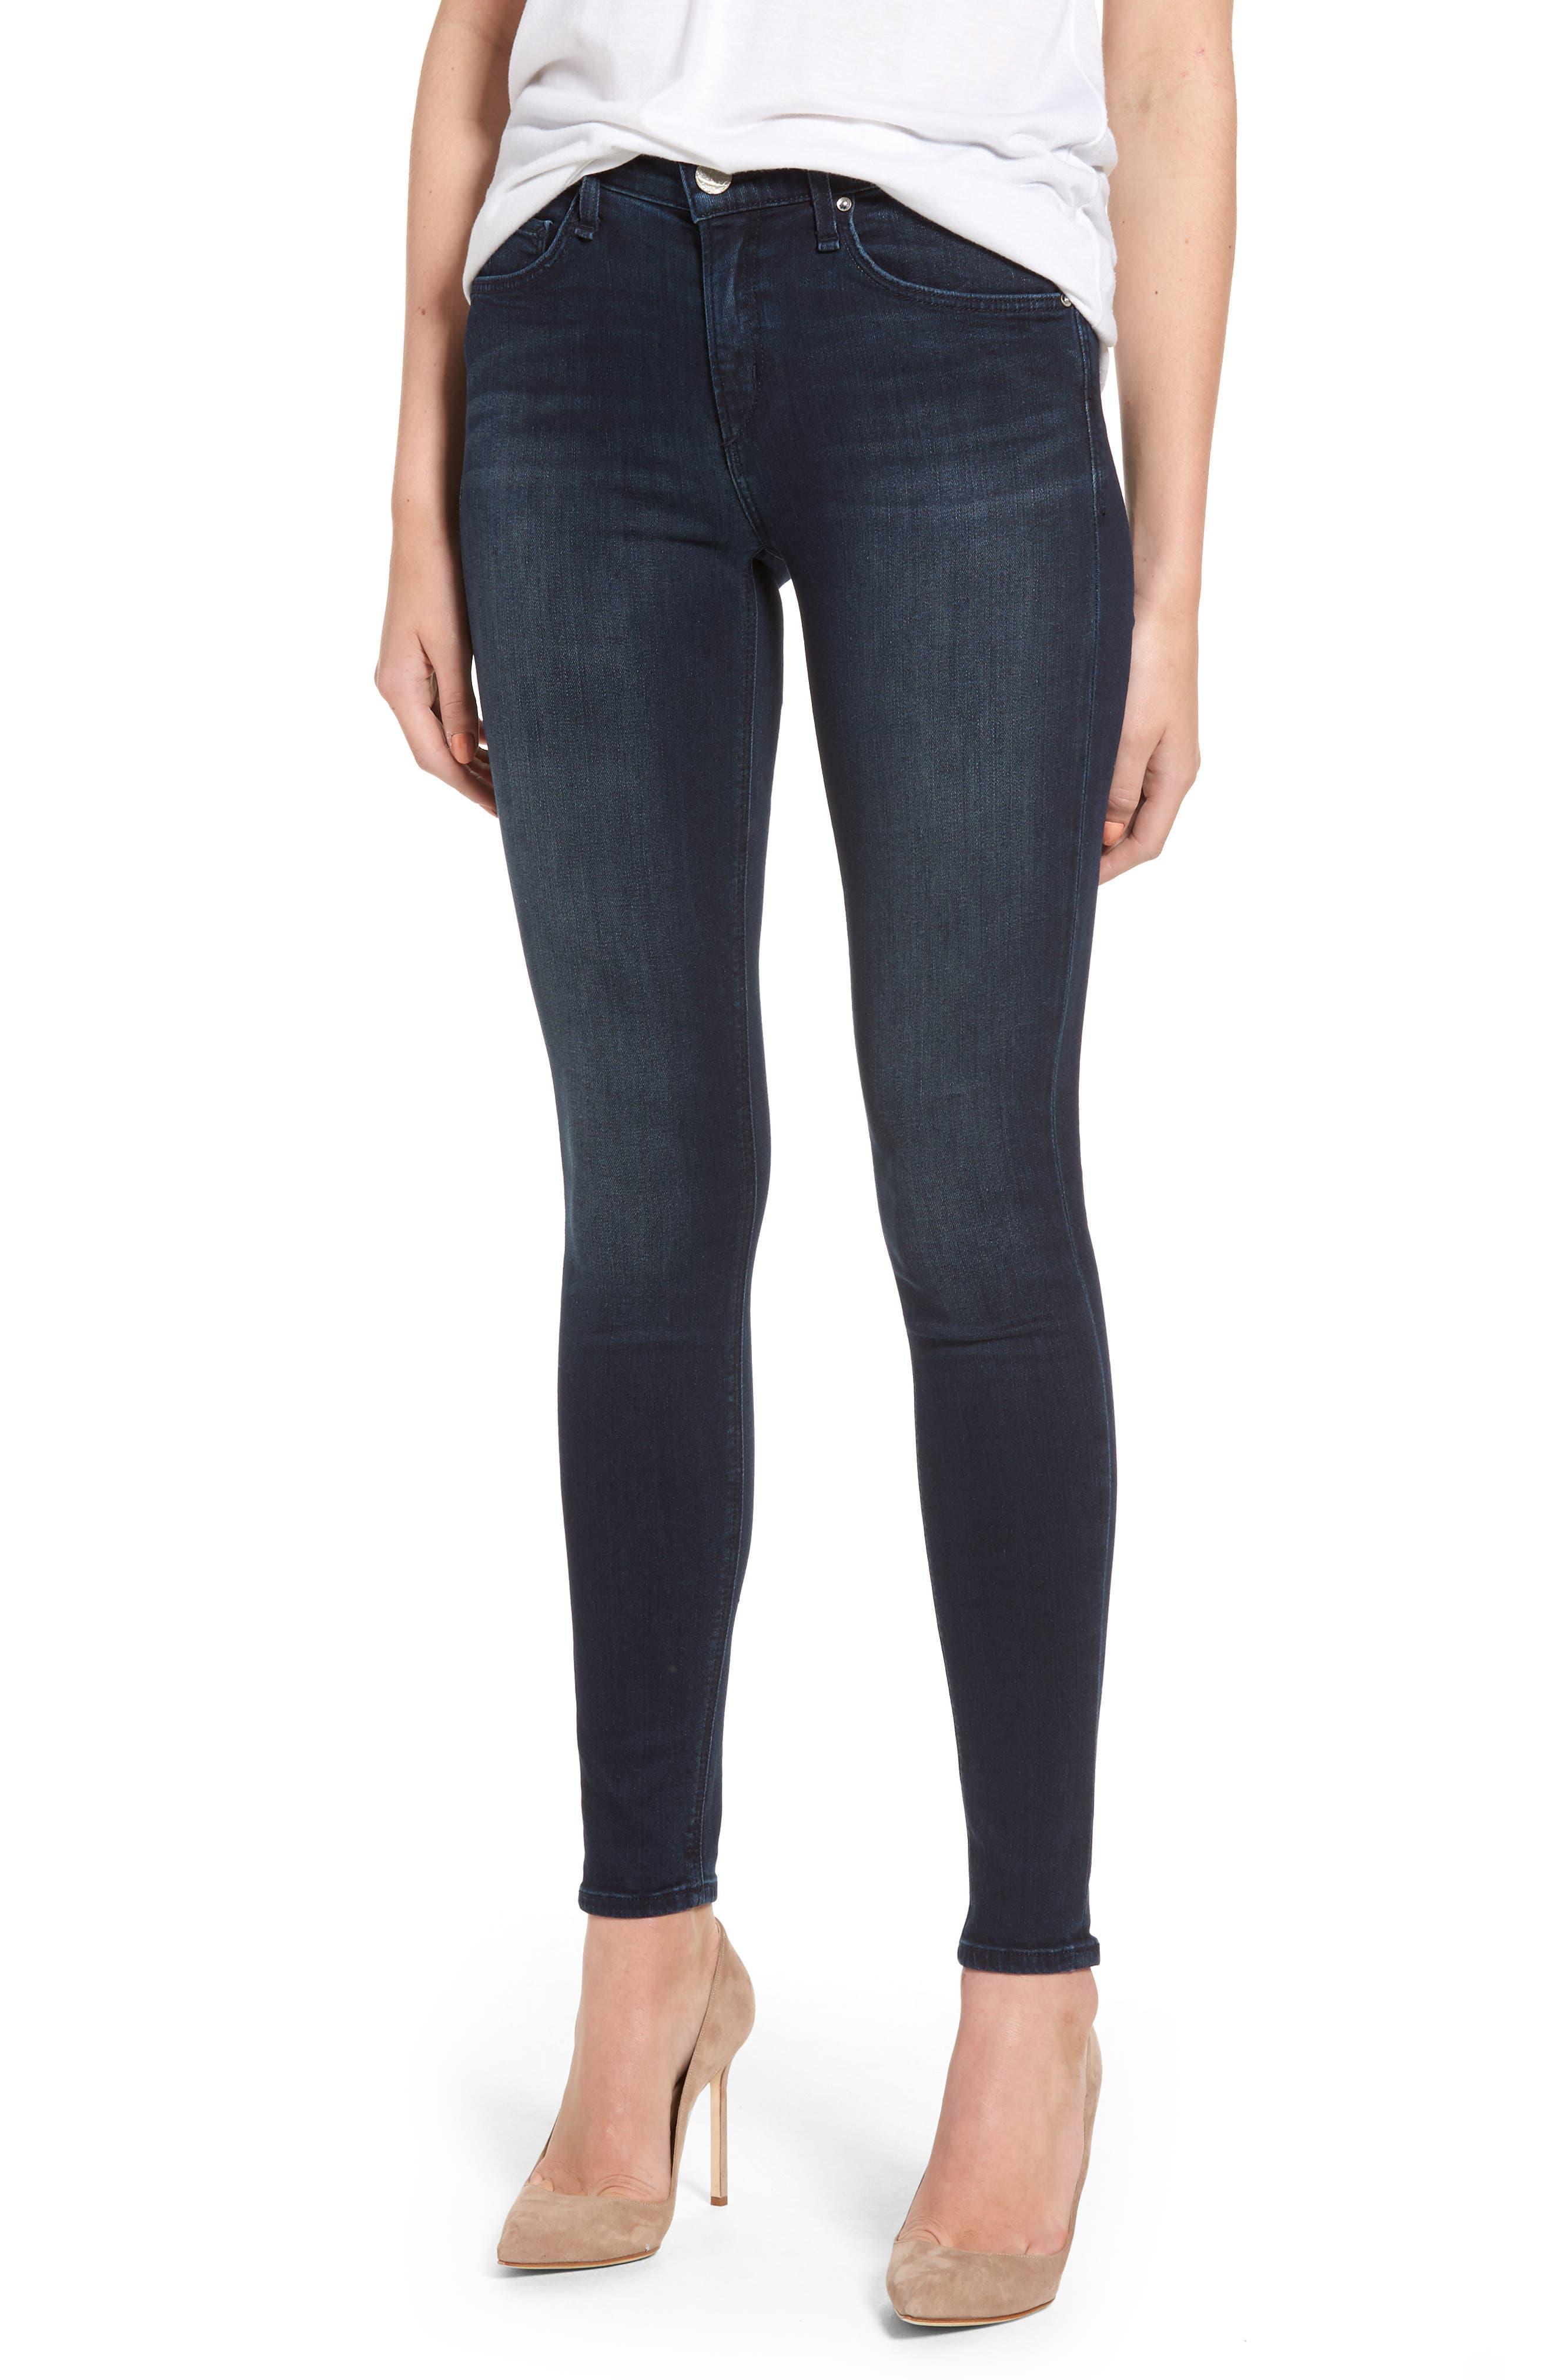 McGuire Newton Skinny Jeans (Splash)